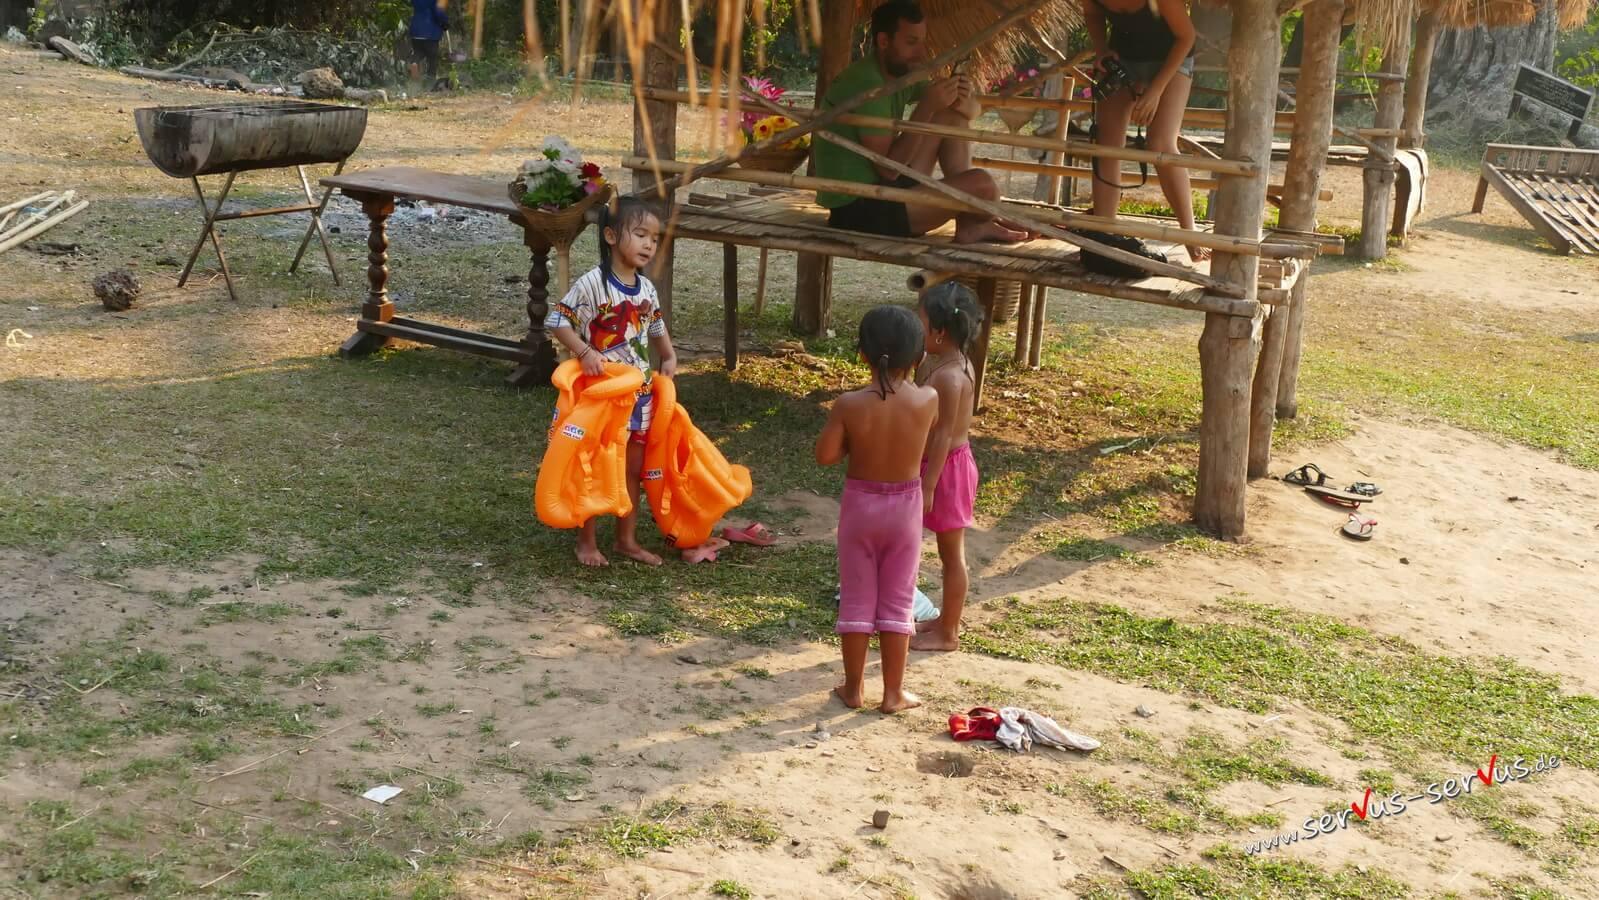 Tad Lo, Laos, Dorfkinder beim baden, Bolavenplateau